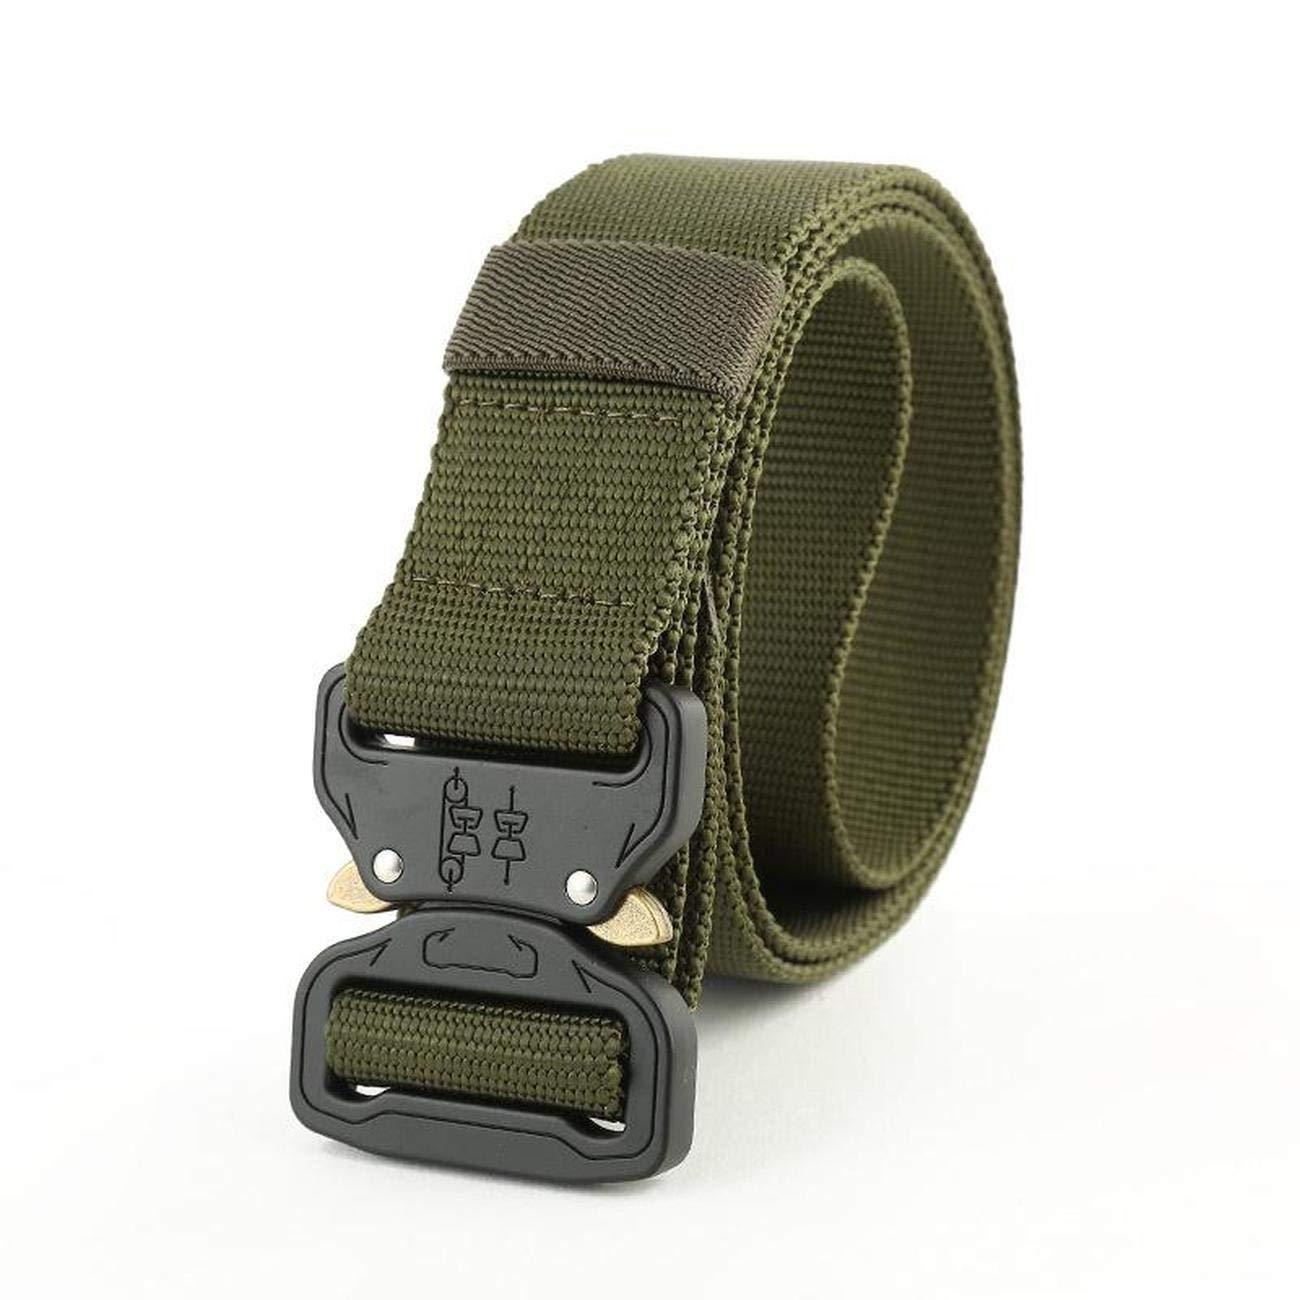 Nethaniah Fashion Belt Outdoor Hiking Military Nylon Buckle Mens